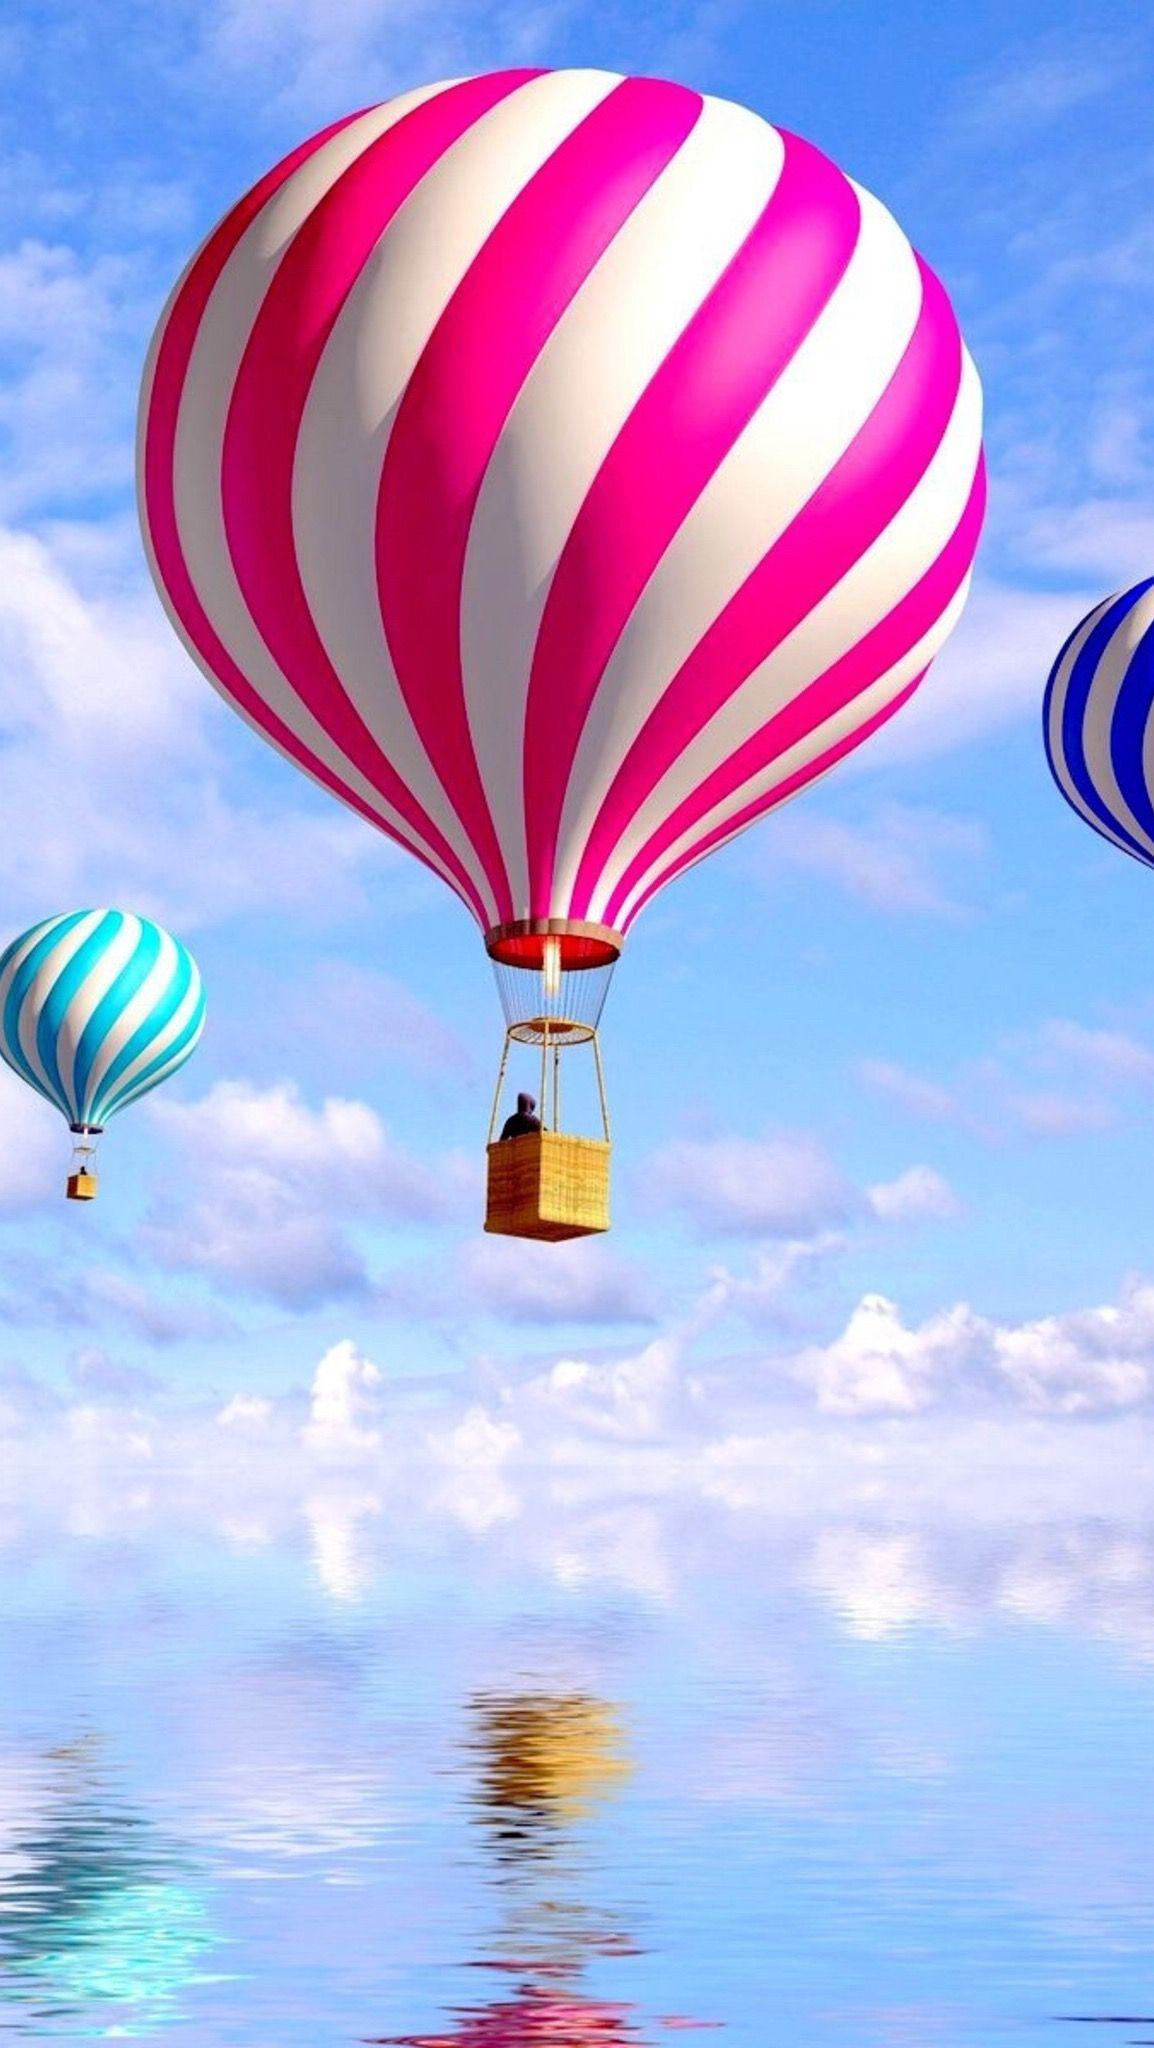 Hd Iphone Wallpaper Hot Air Balloon